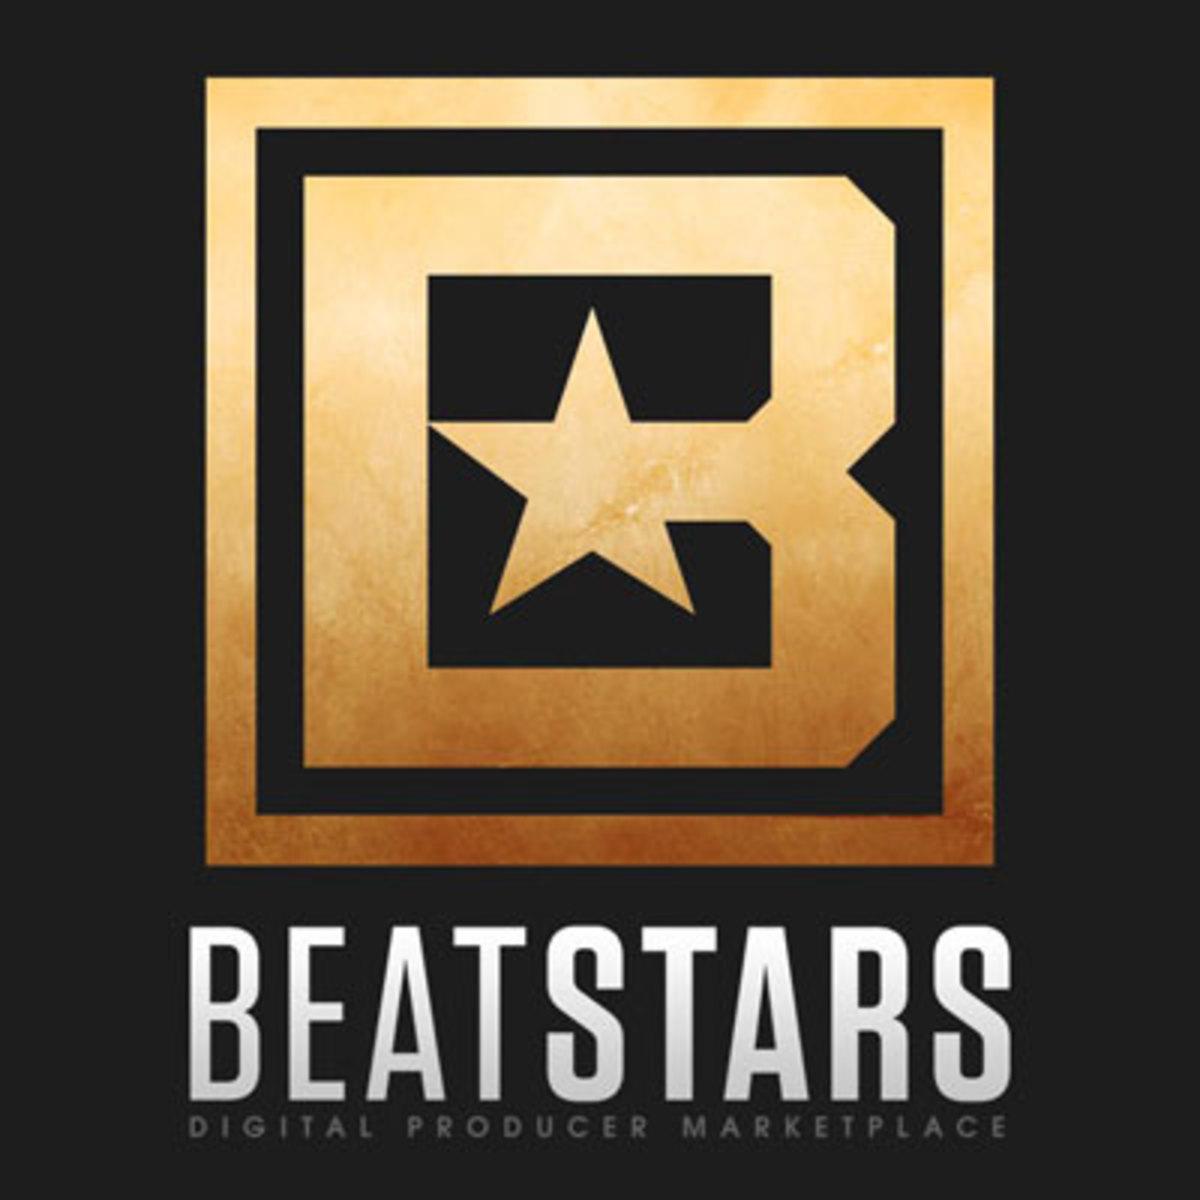 beatstarsnews.jpg